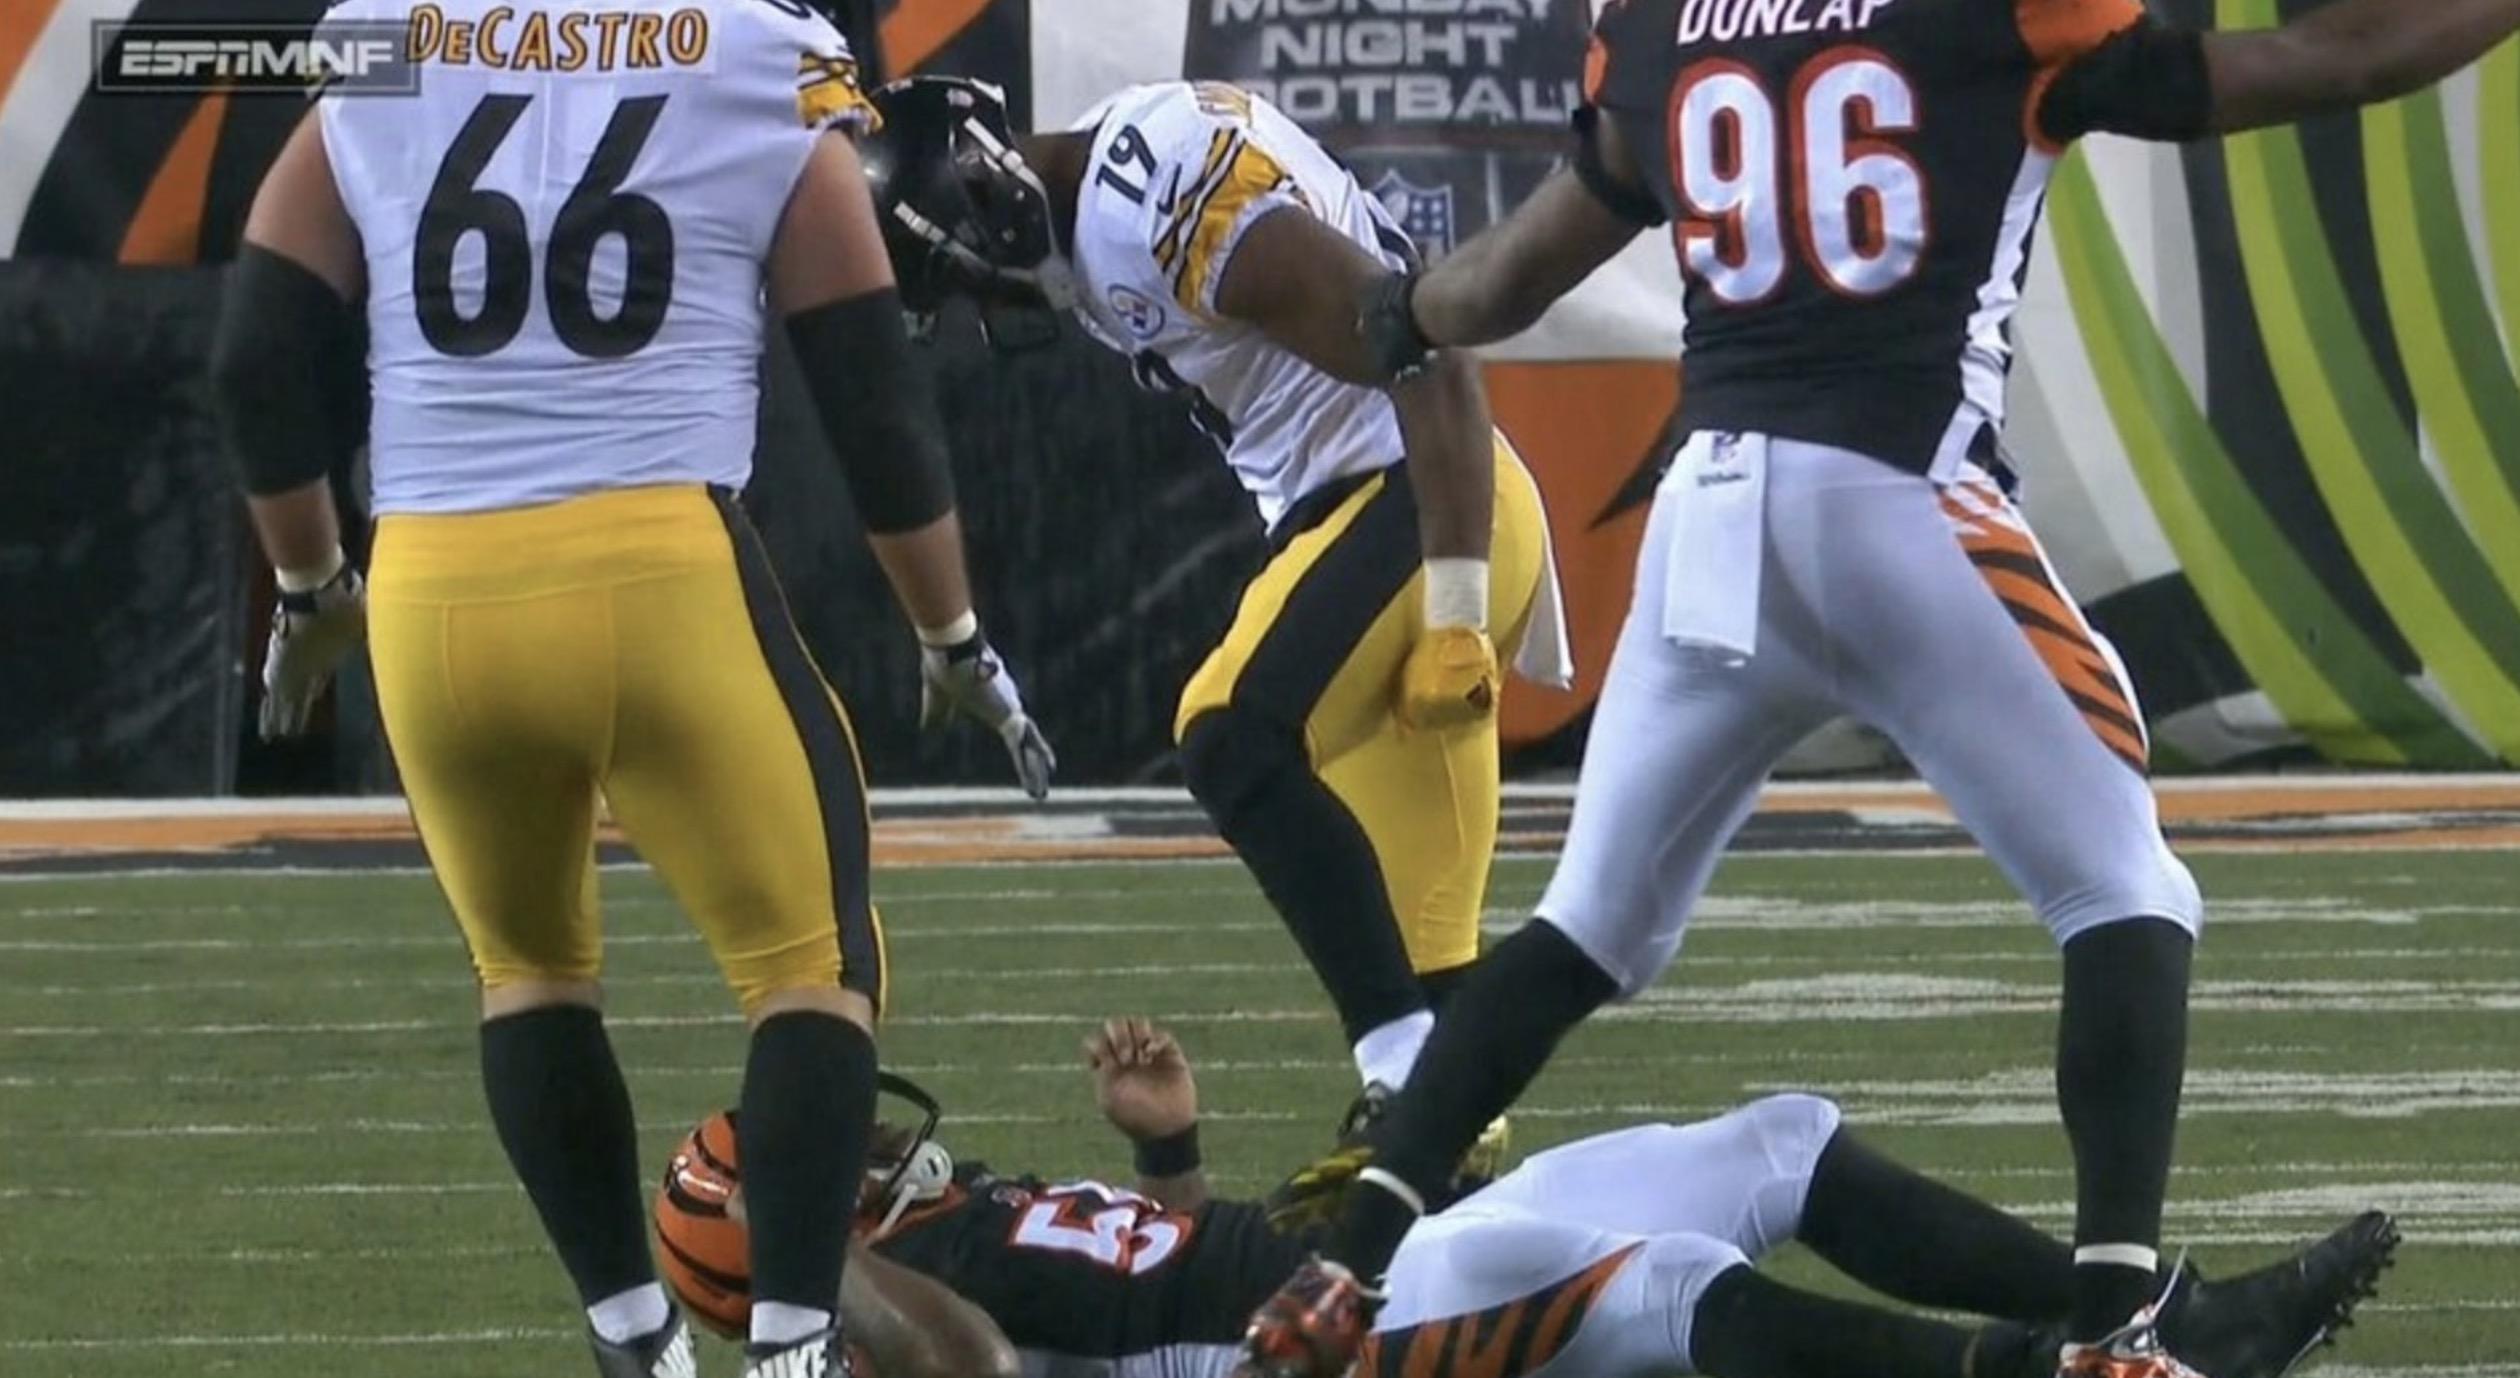 Antonio Brown's toe sprain shouldn't hamper him on MNF